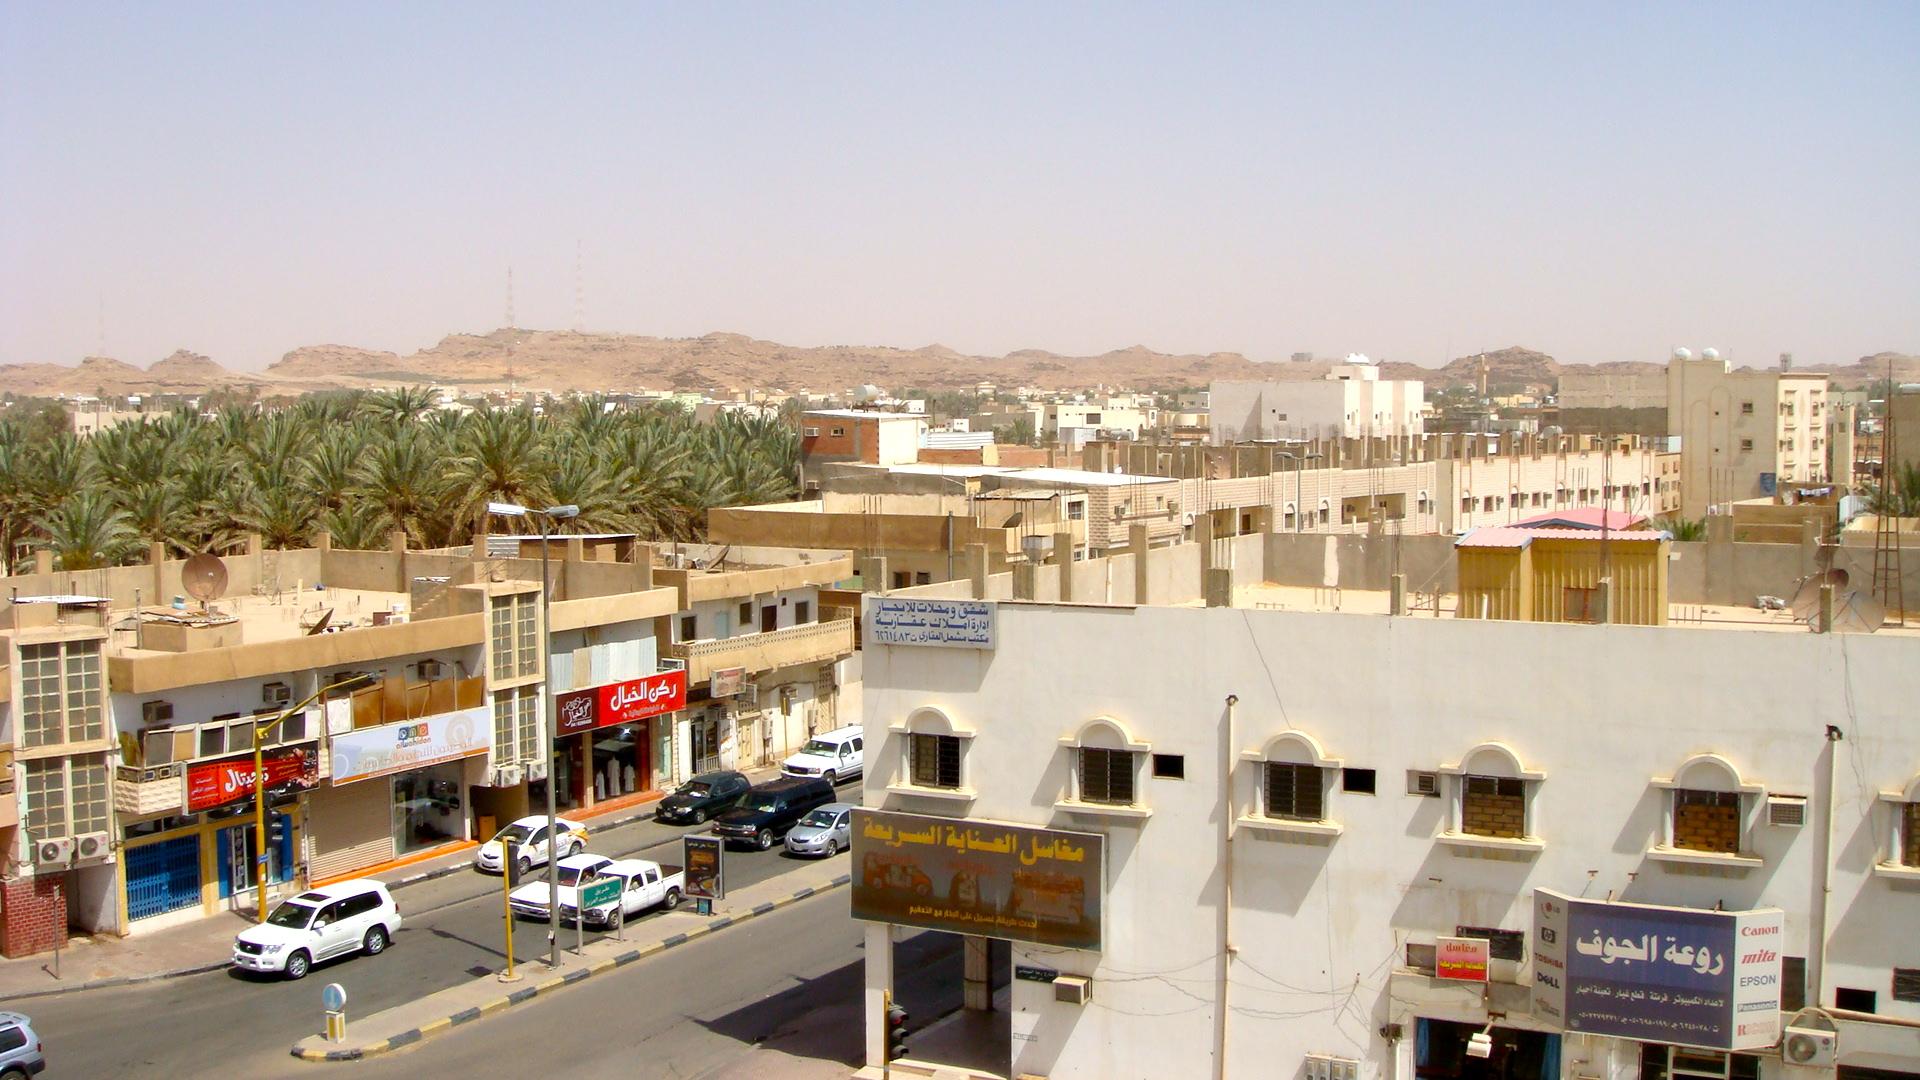 Downtown Sakaka 08 Nigel Of Arabia